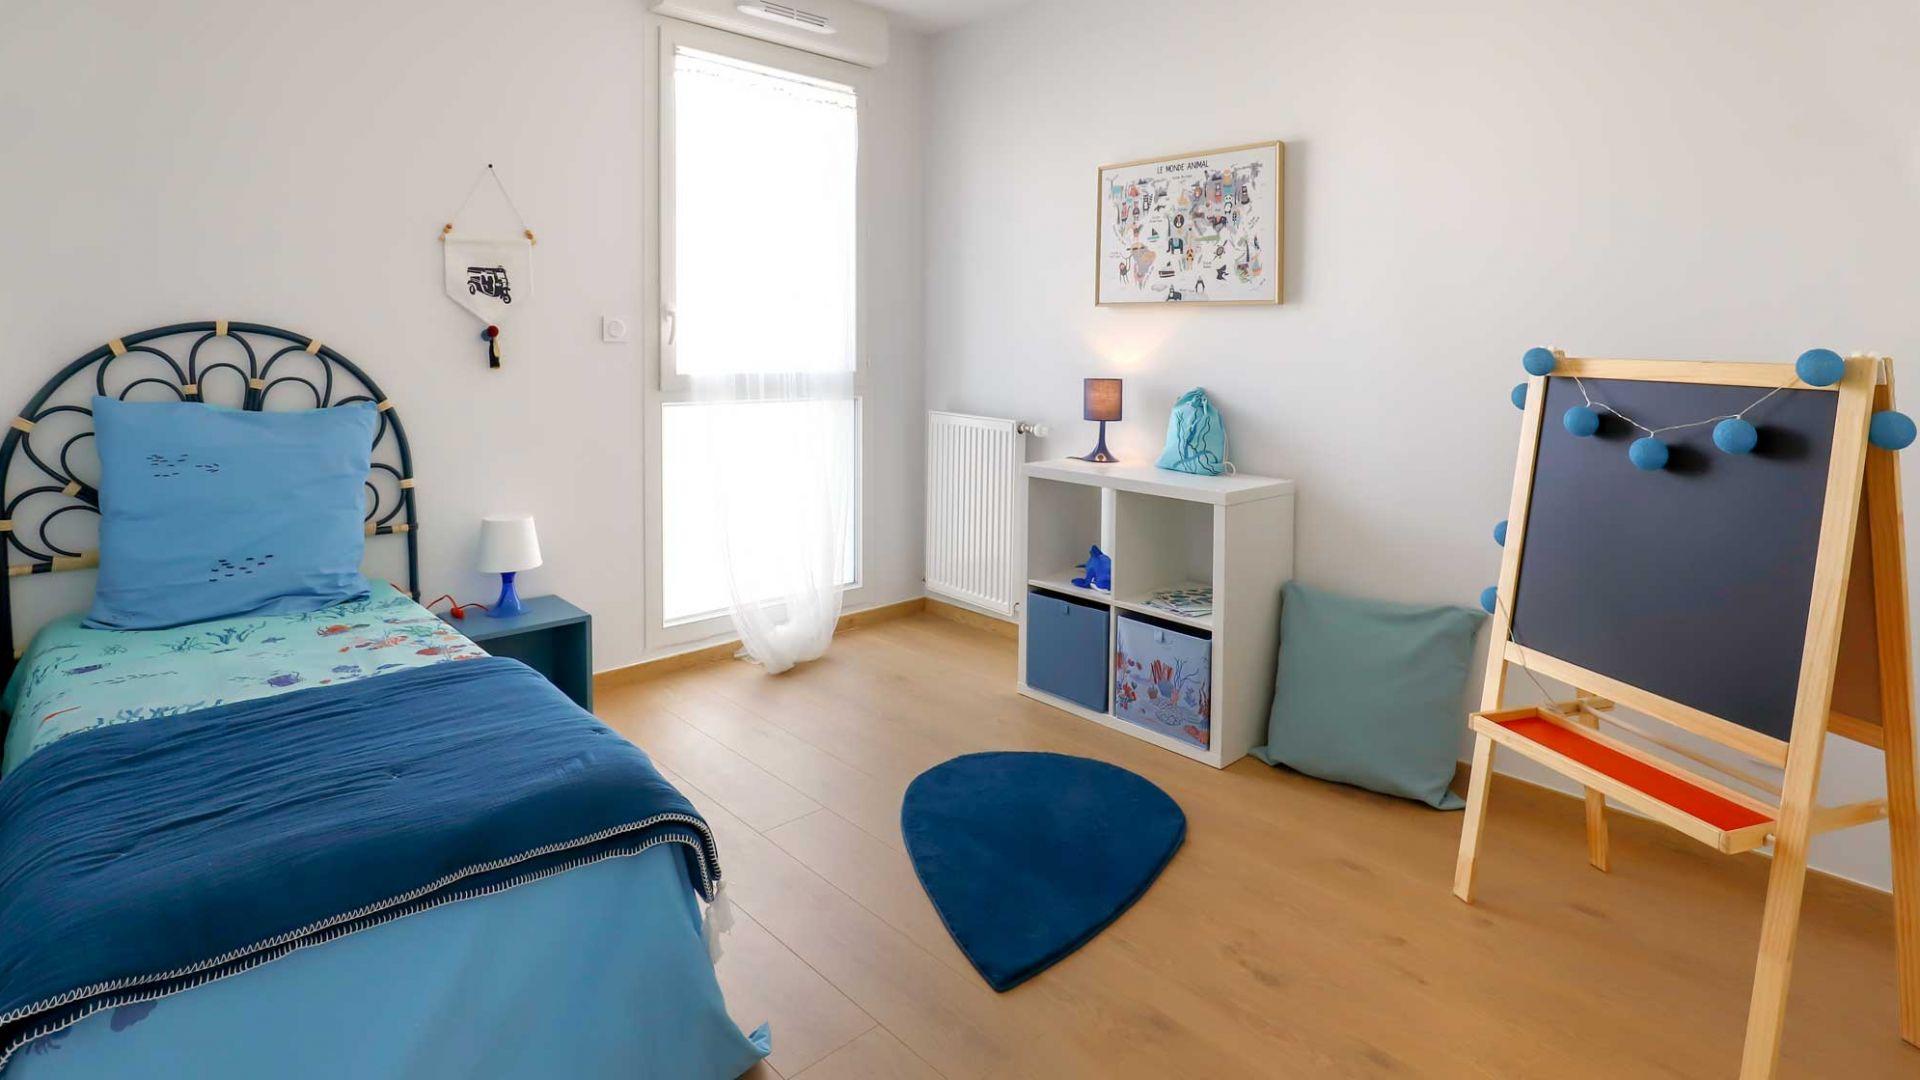 GreenCity immobilier - Blagnac-Beauzelle - 31700 - LB47 - villa T5 - chambre enfant